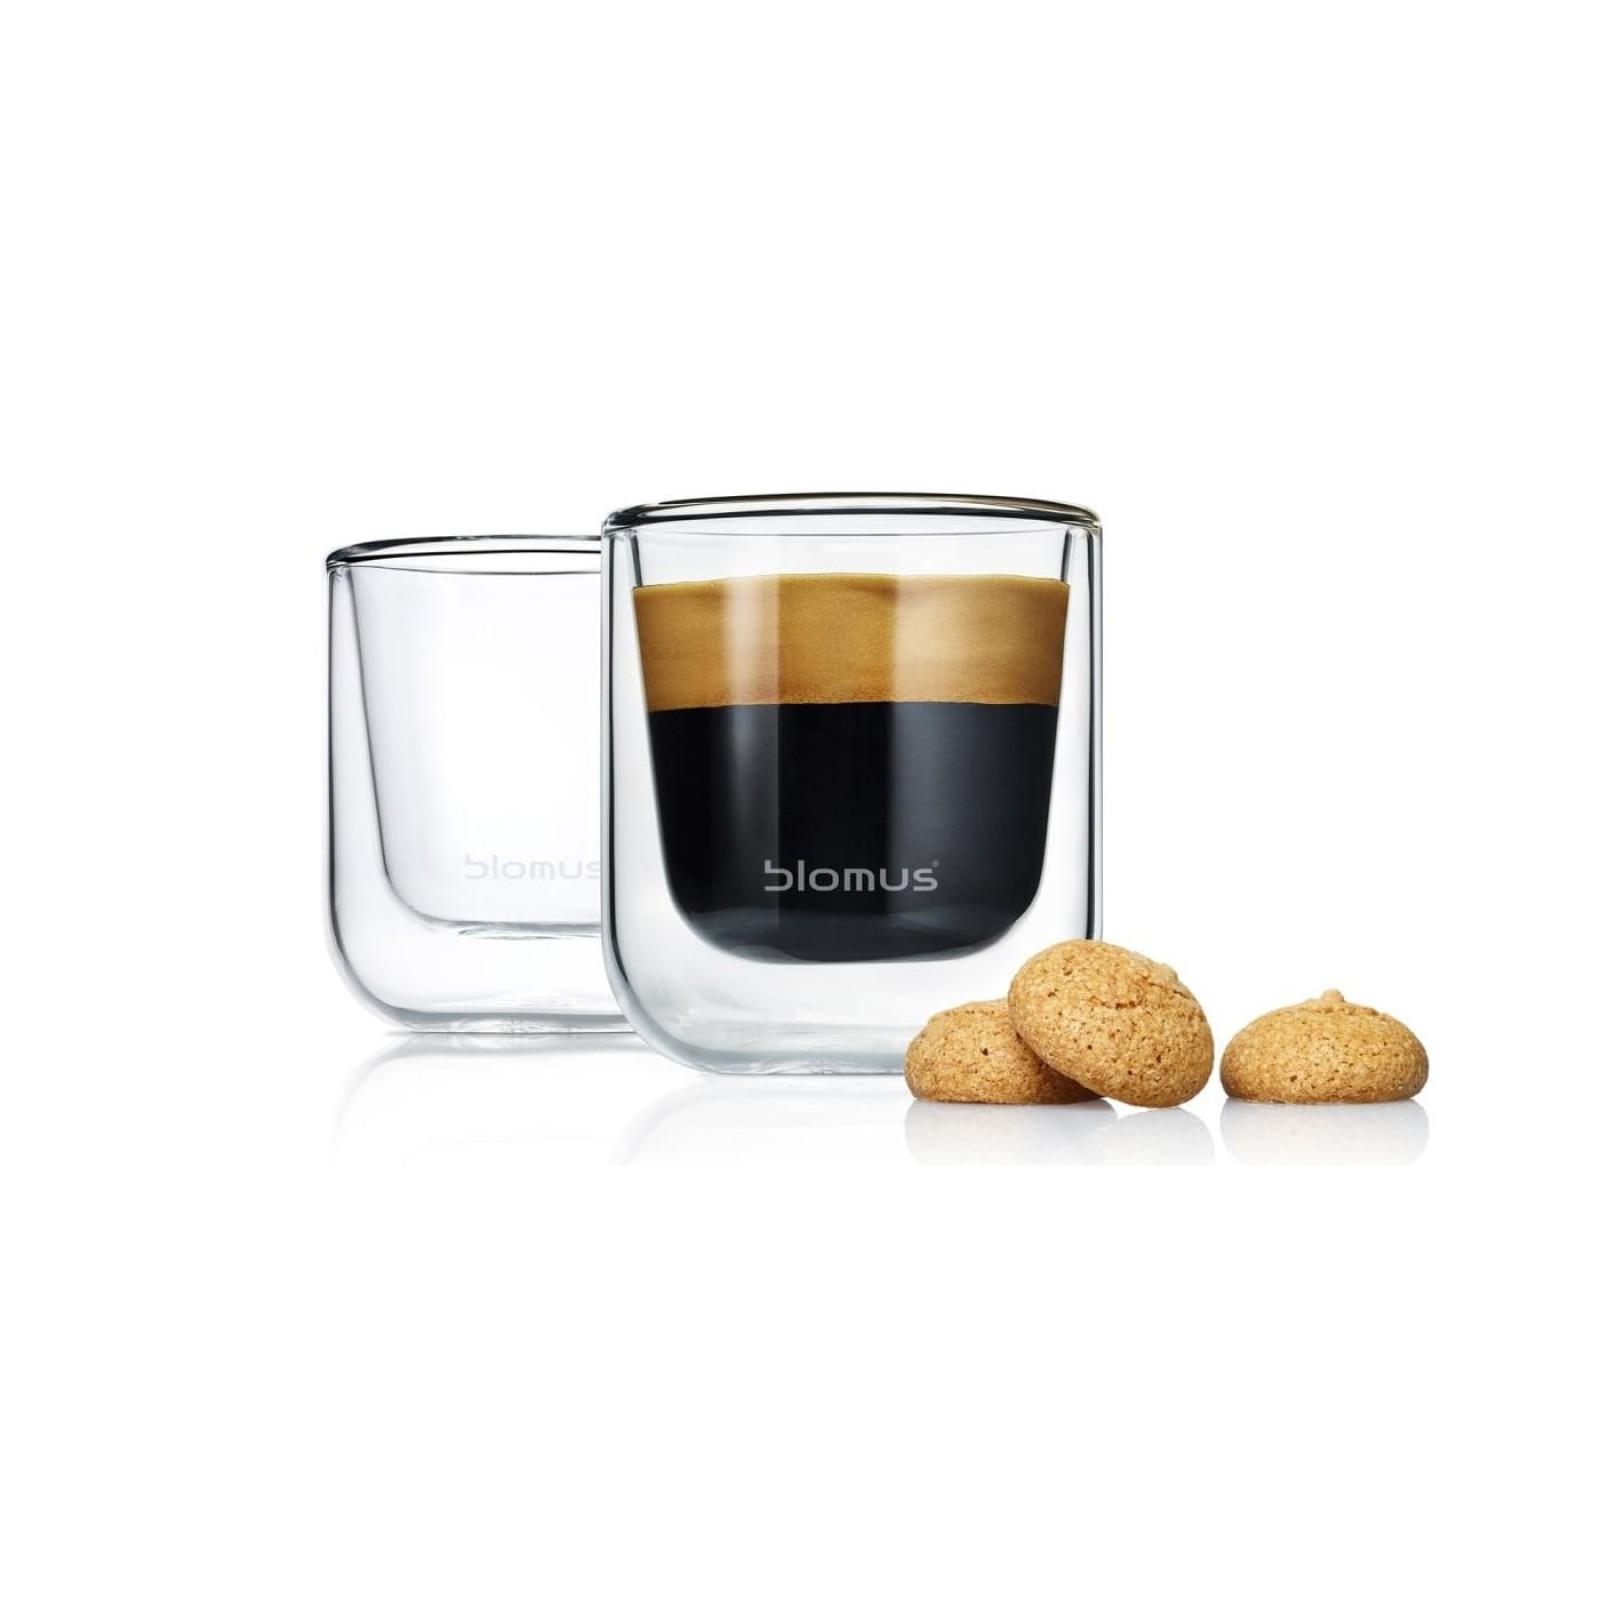 NERO Insulated Espresso Glasses 80ml (Set of 2) - Blomus